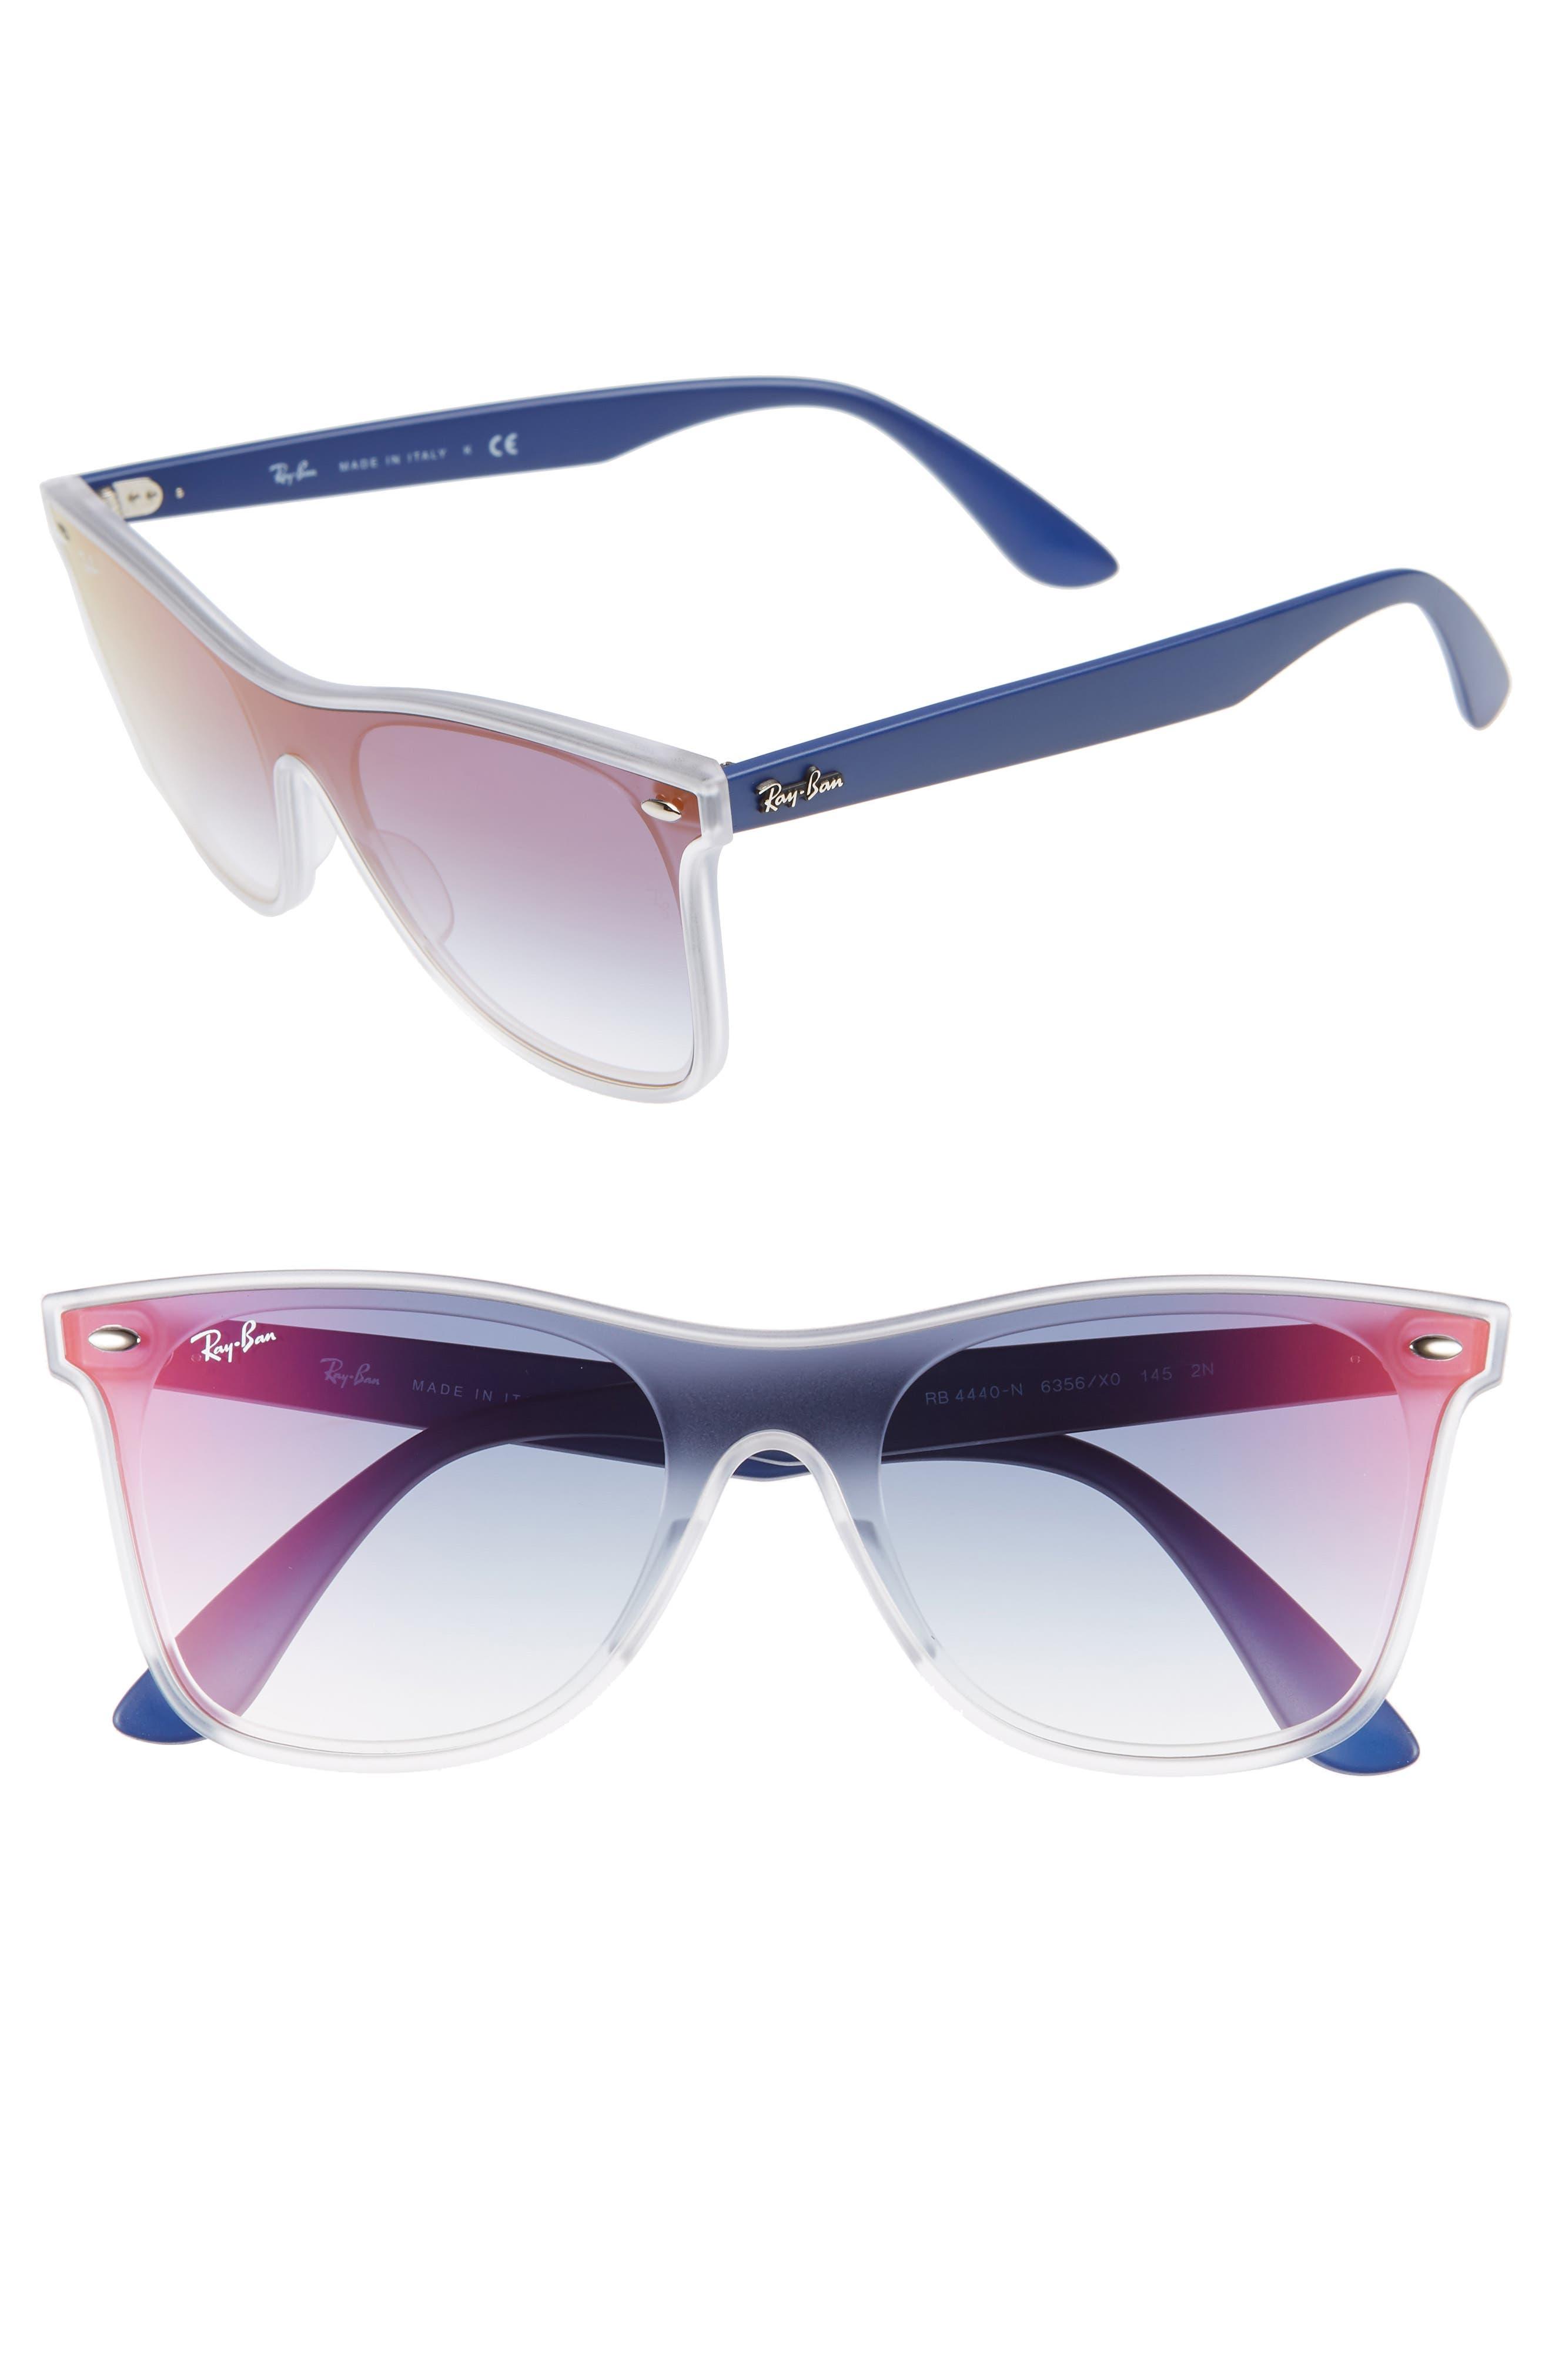 Ray-Ban 5m Navigator Sunglasses - Purple Blue